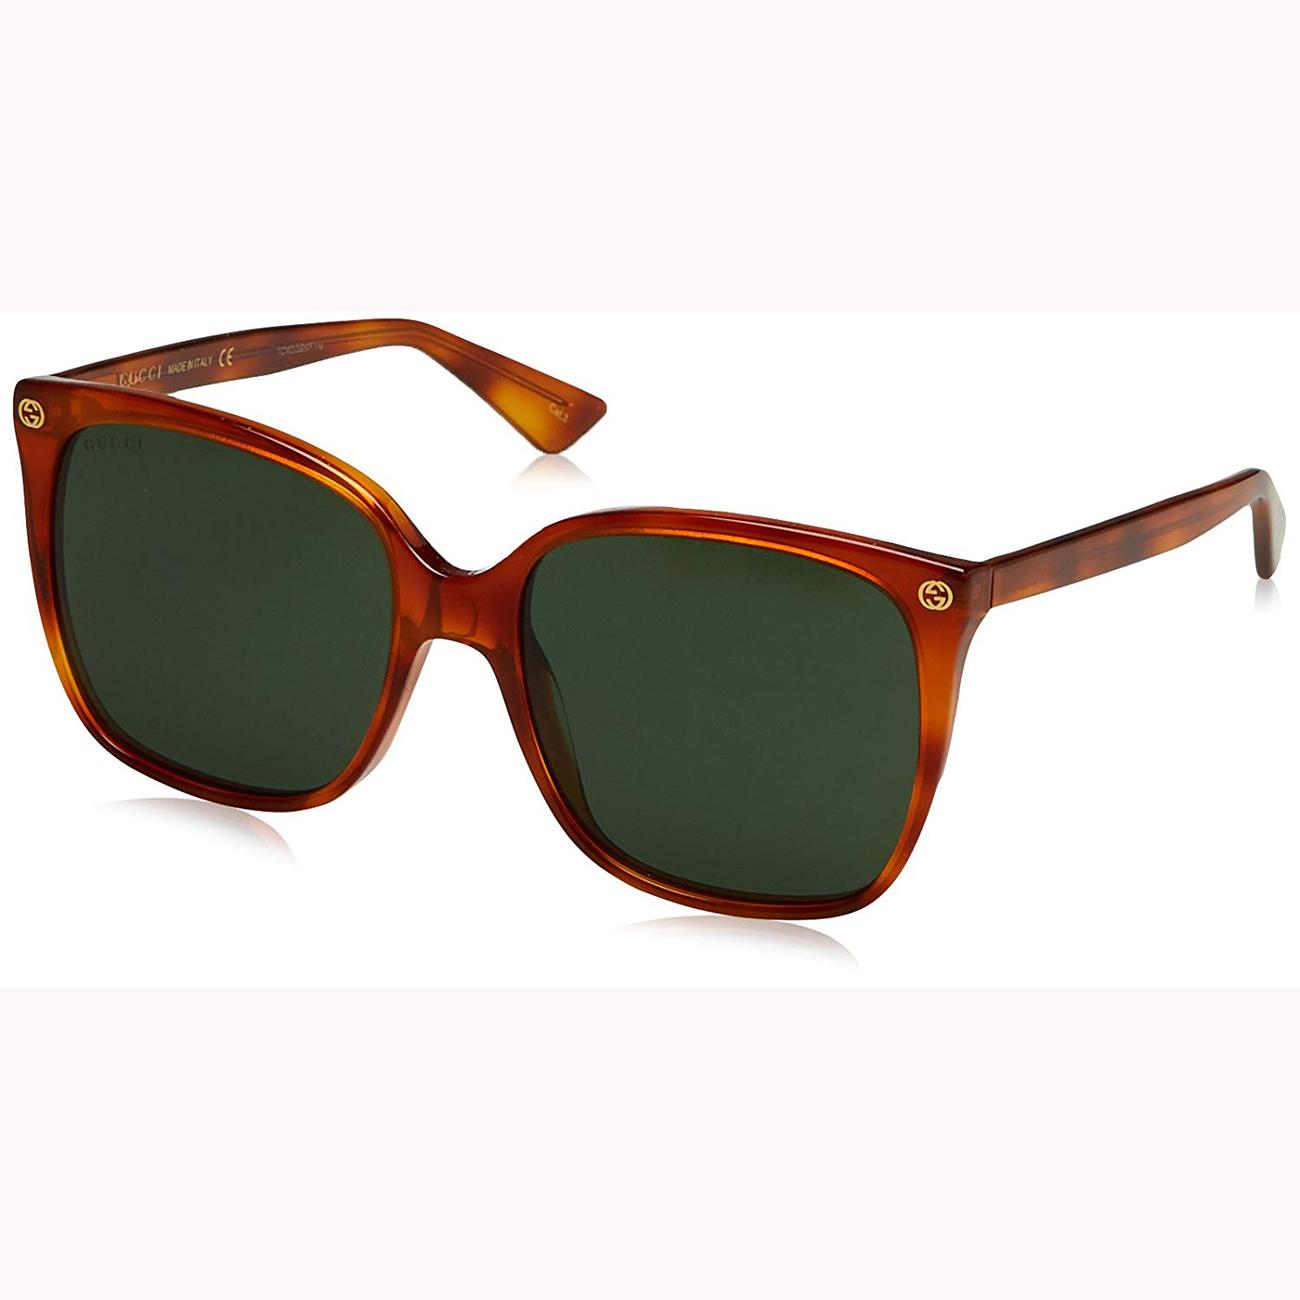 9d8b68a42bab GUCCI Havana GG0022S 002 Square Oversized Sunglasses